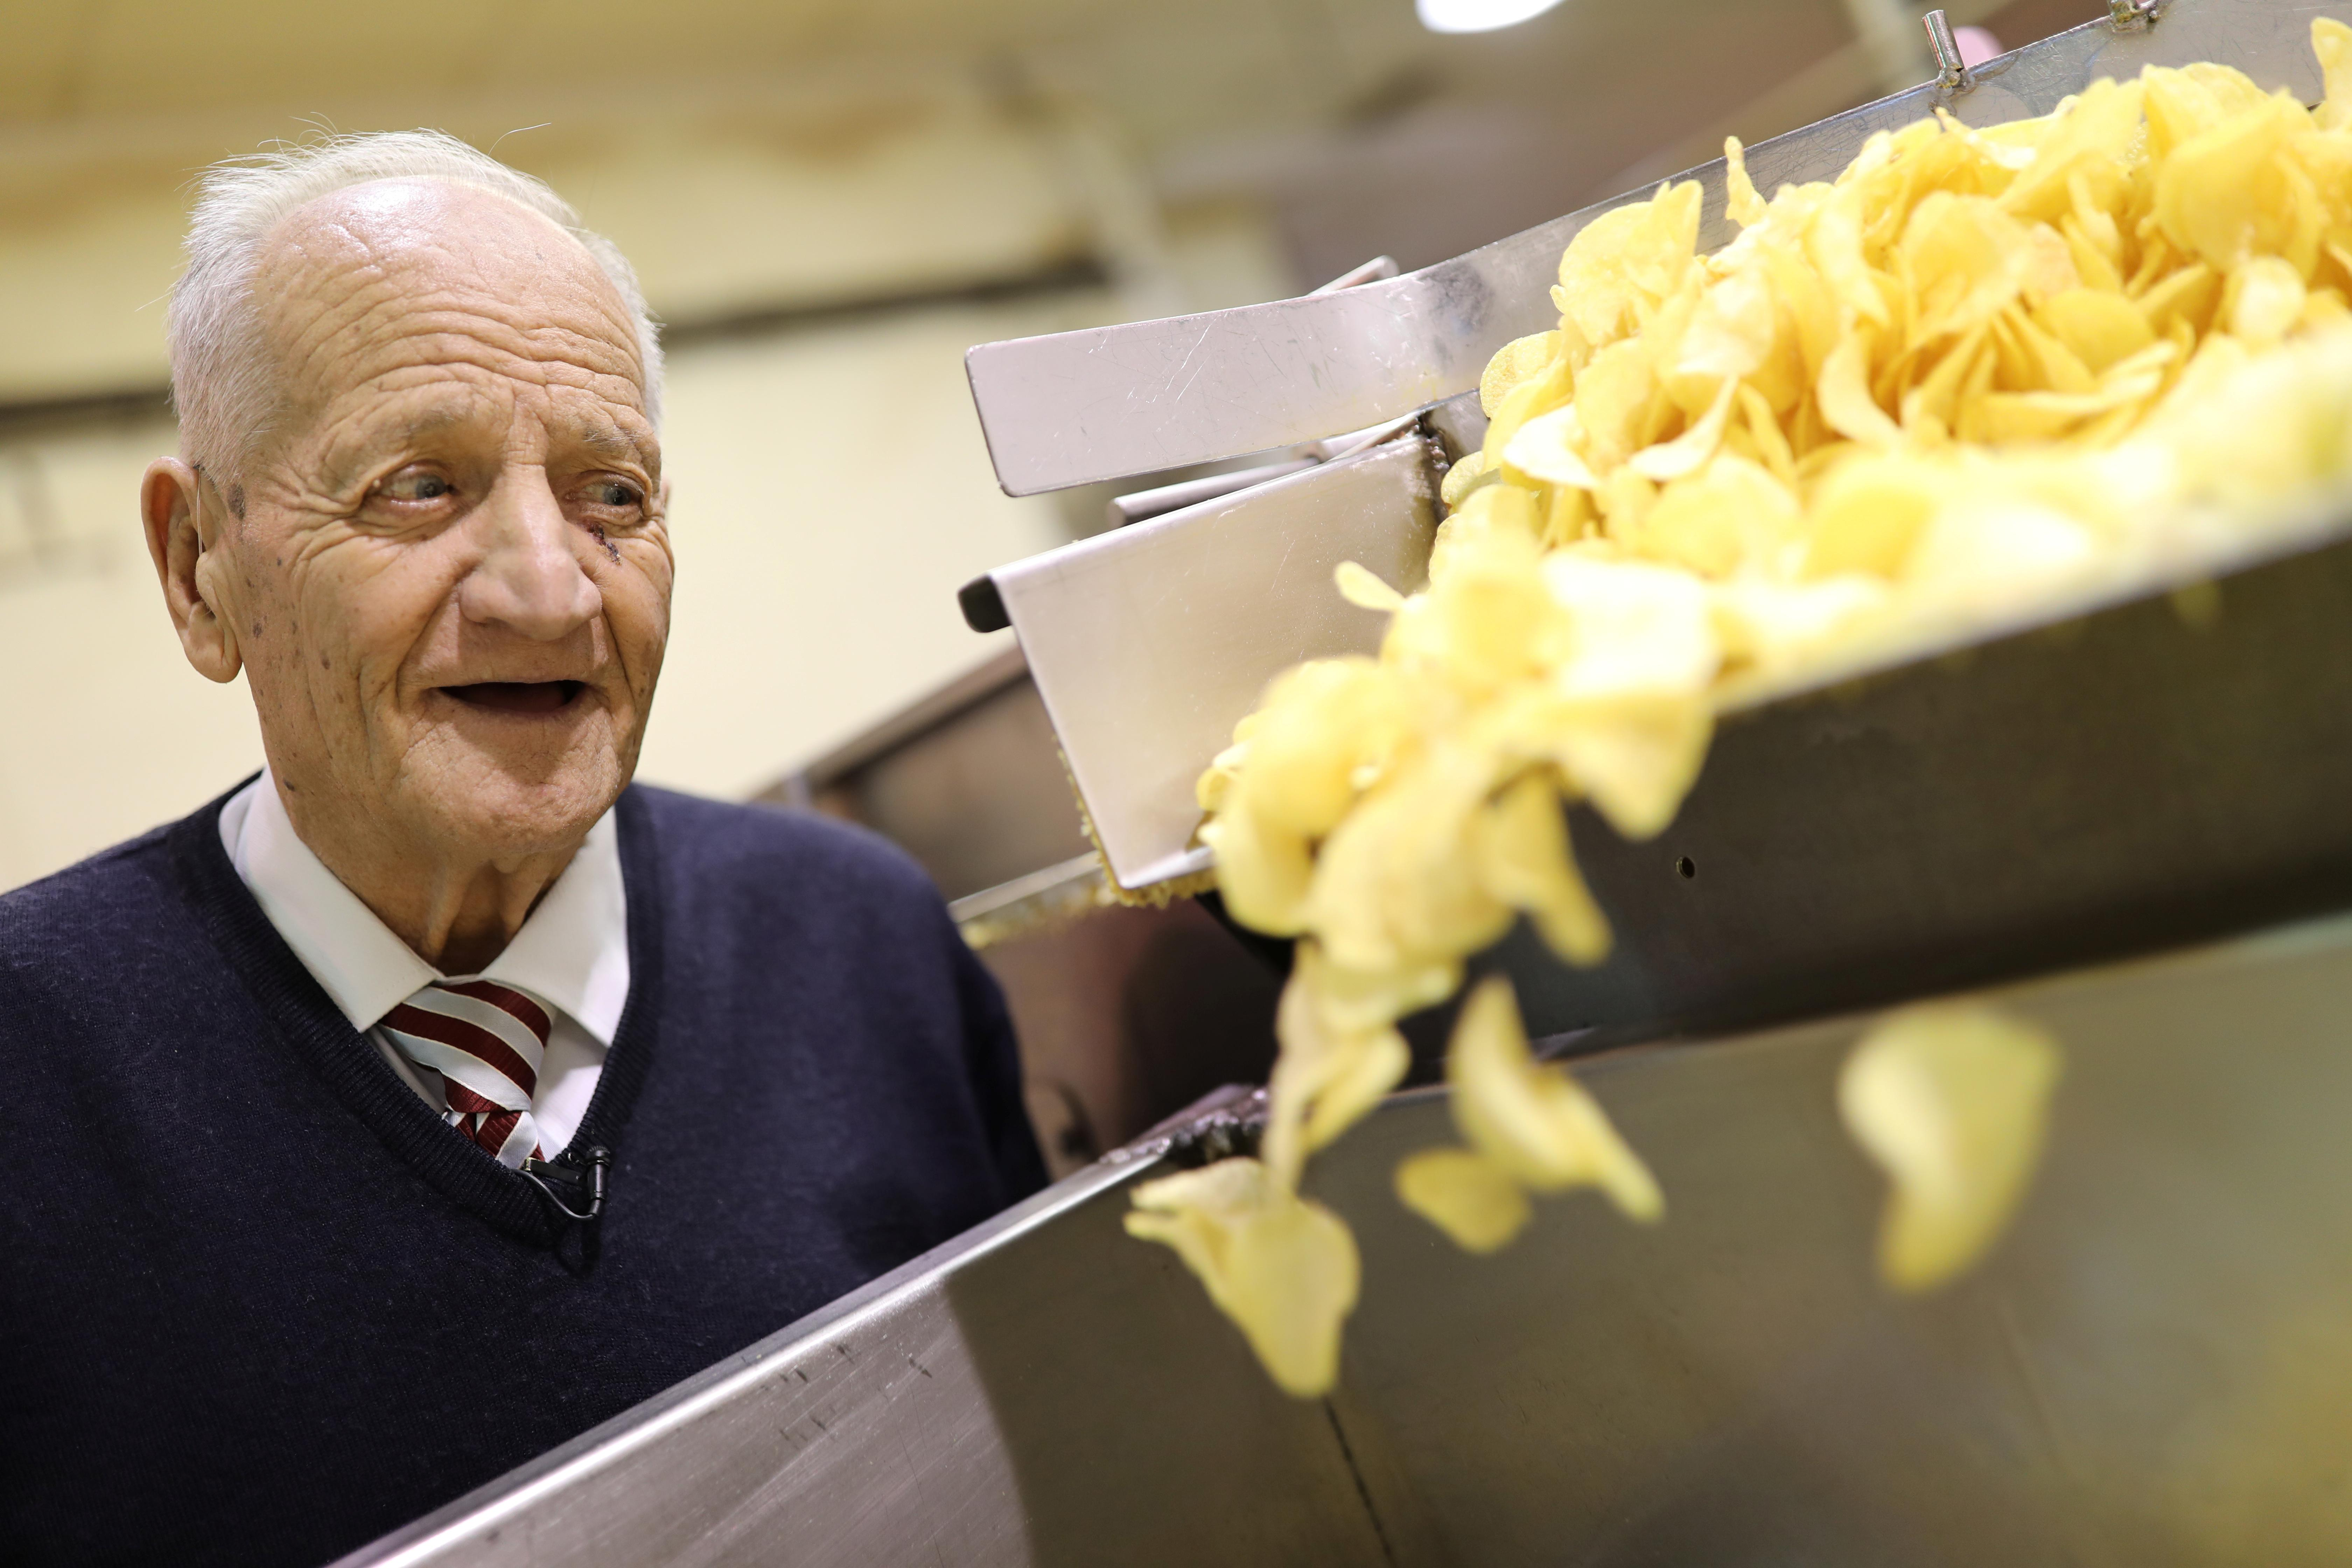 Movie magic: Spanish La Vista potato chip sales boom on Korean film cameo